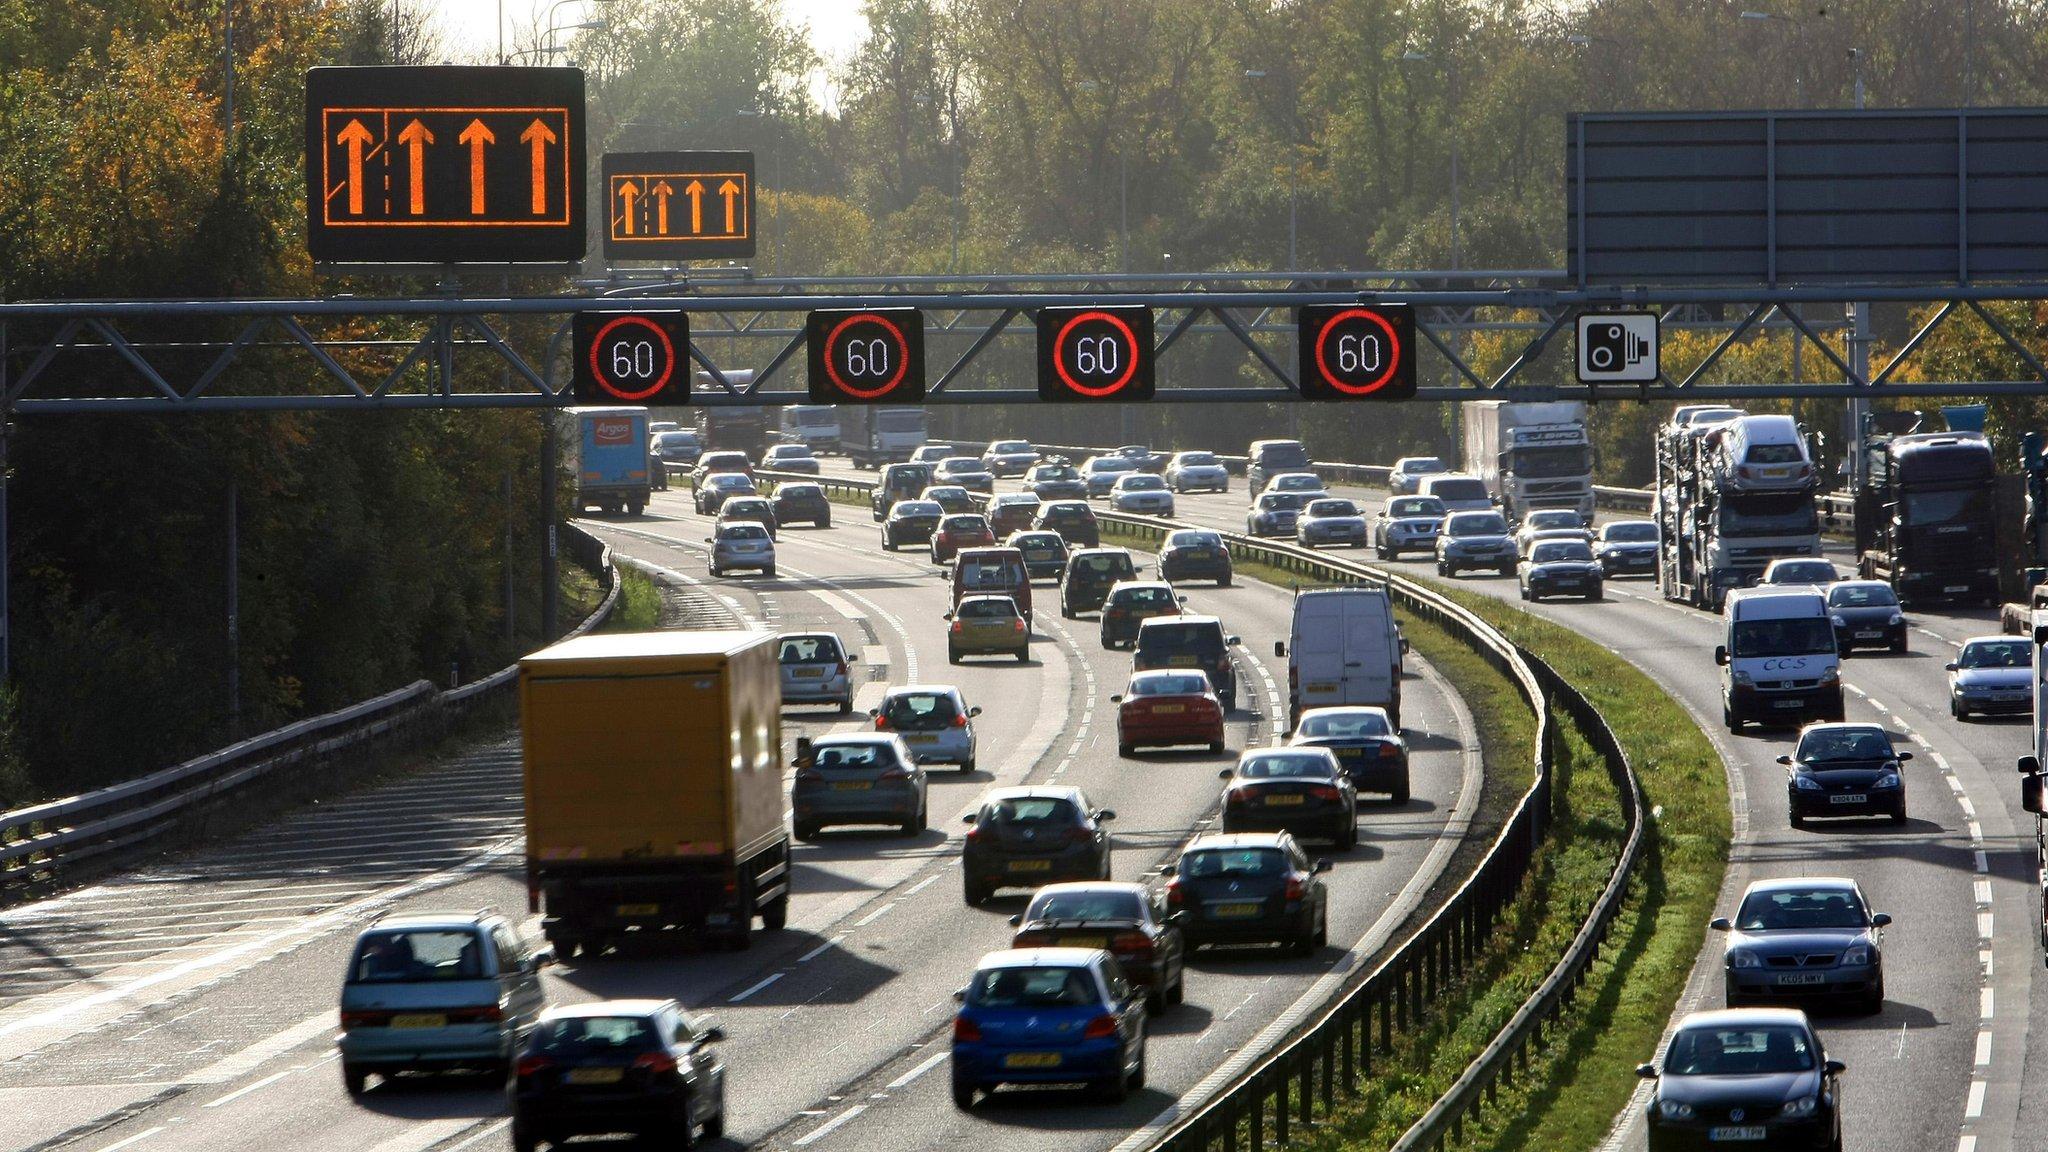 Traffic tailback warning for bank holiday weekend